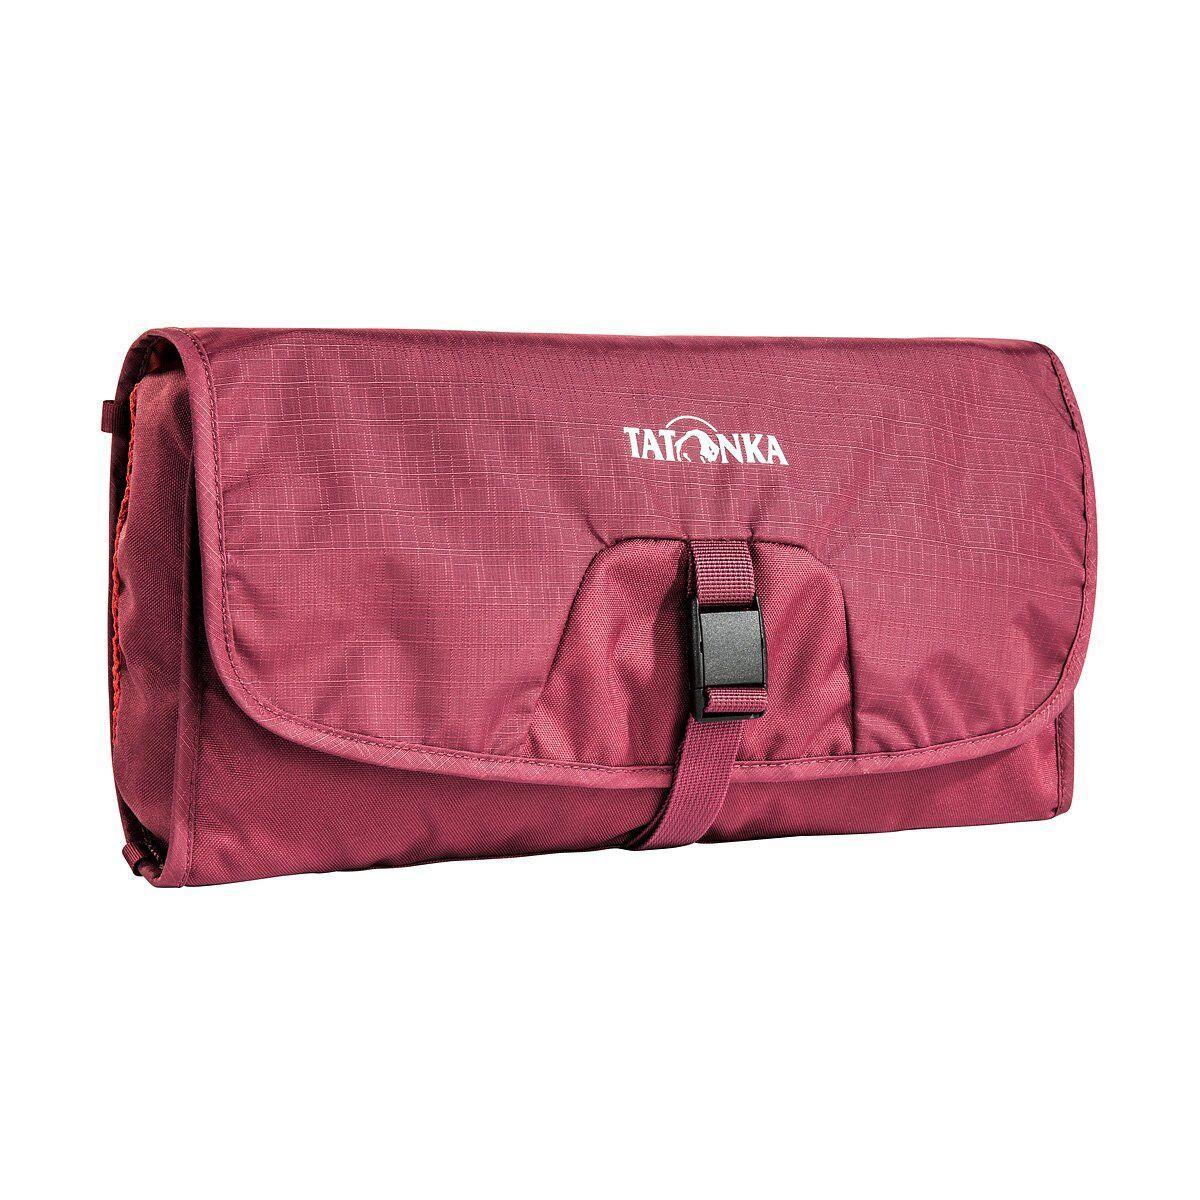 Косметичка Tatonka - Travelcare, Bordeaux Red (TAT 2782.047)